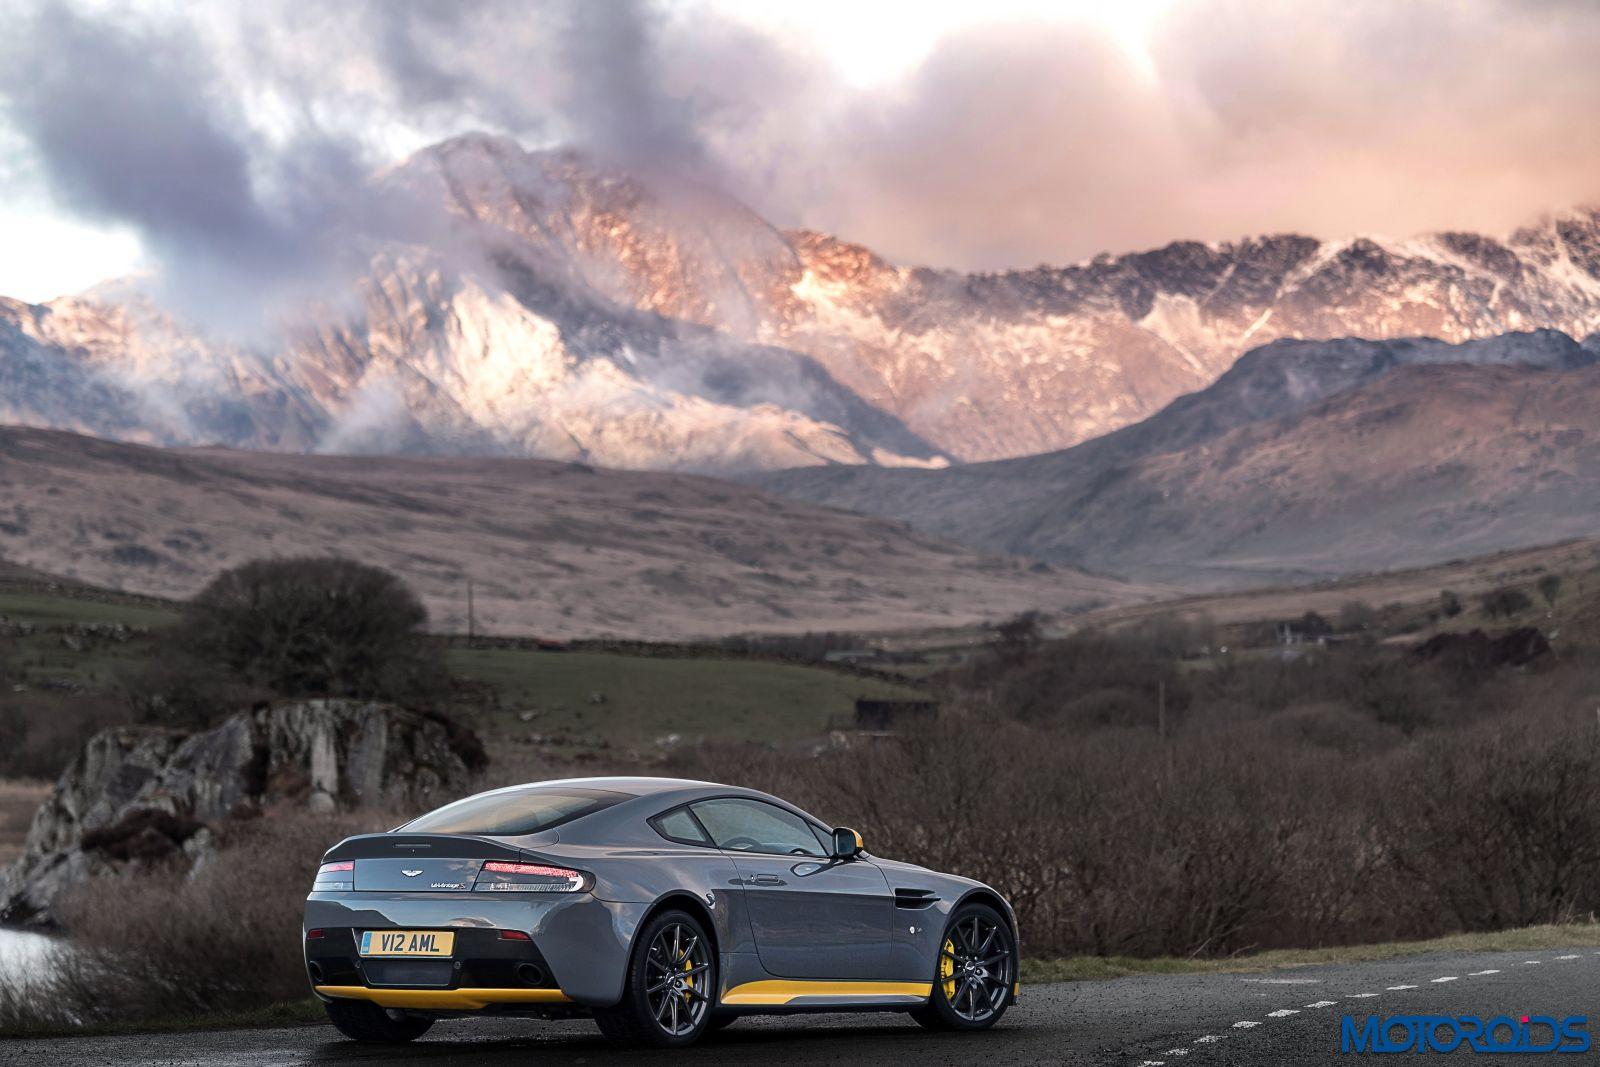 2017 Aston Martin V12 Vantage S Gets A 7 Speed Manual Transmission